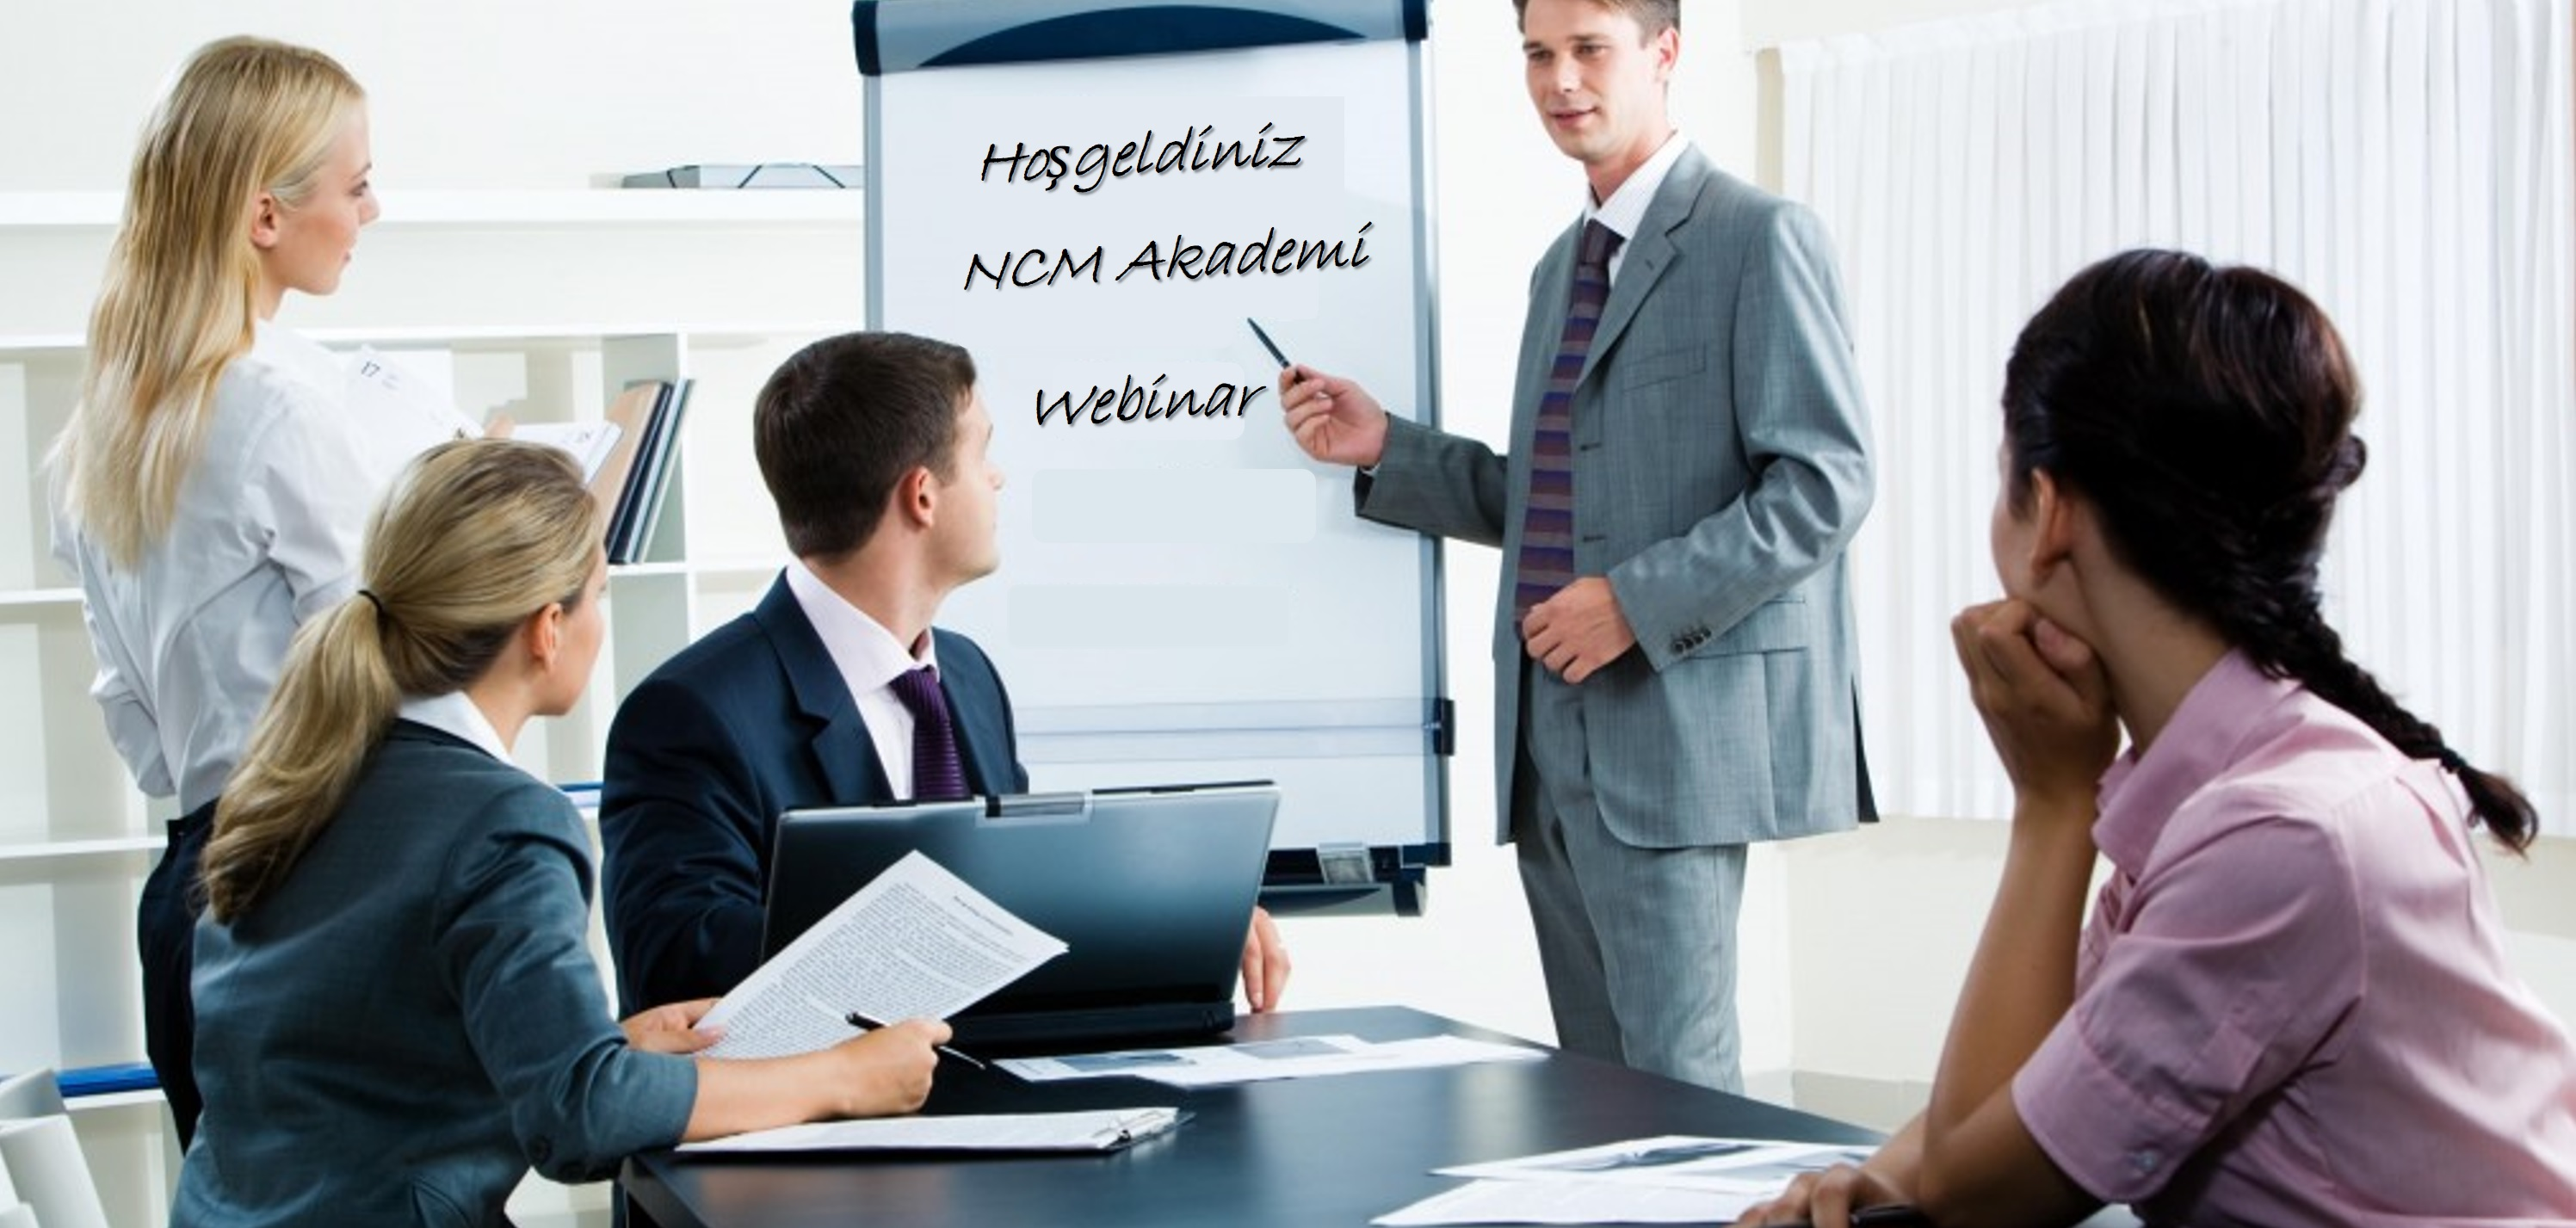 http://ncmgmbh.vedubox.net/pages/login